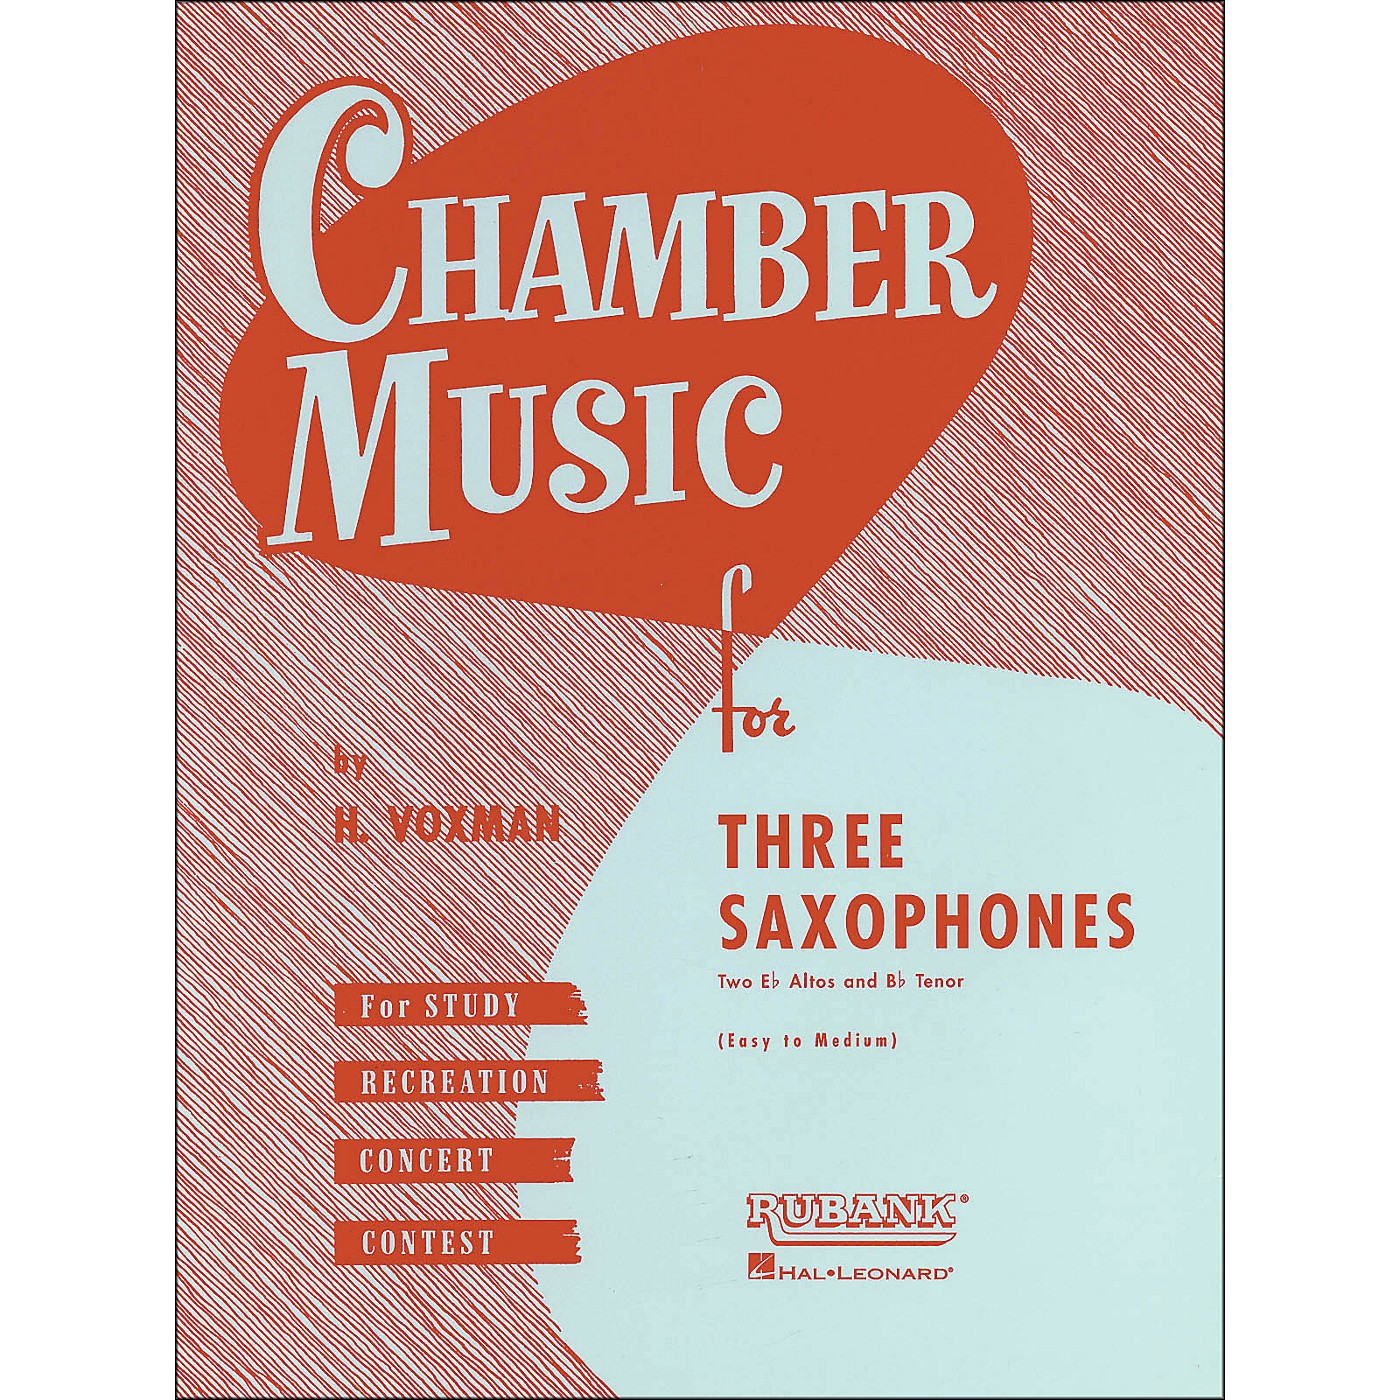 Hal Leonard Chamber Music Series Three Saxophones Two Altos And Tenor - Easy To Medium thumbnail